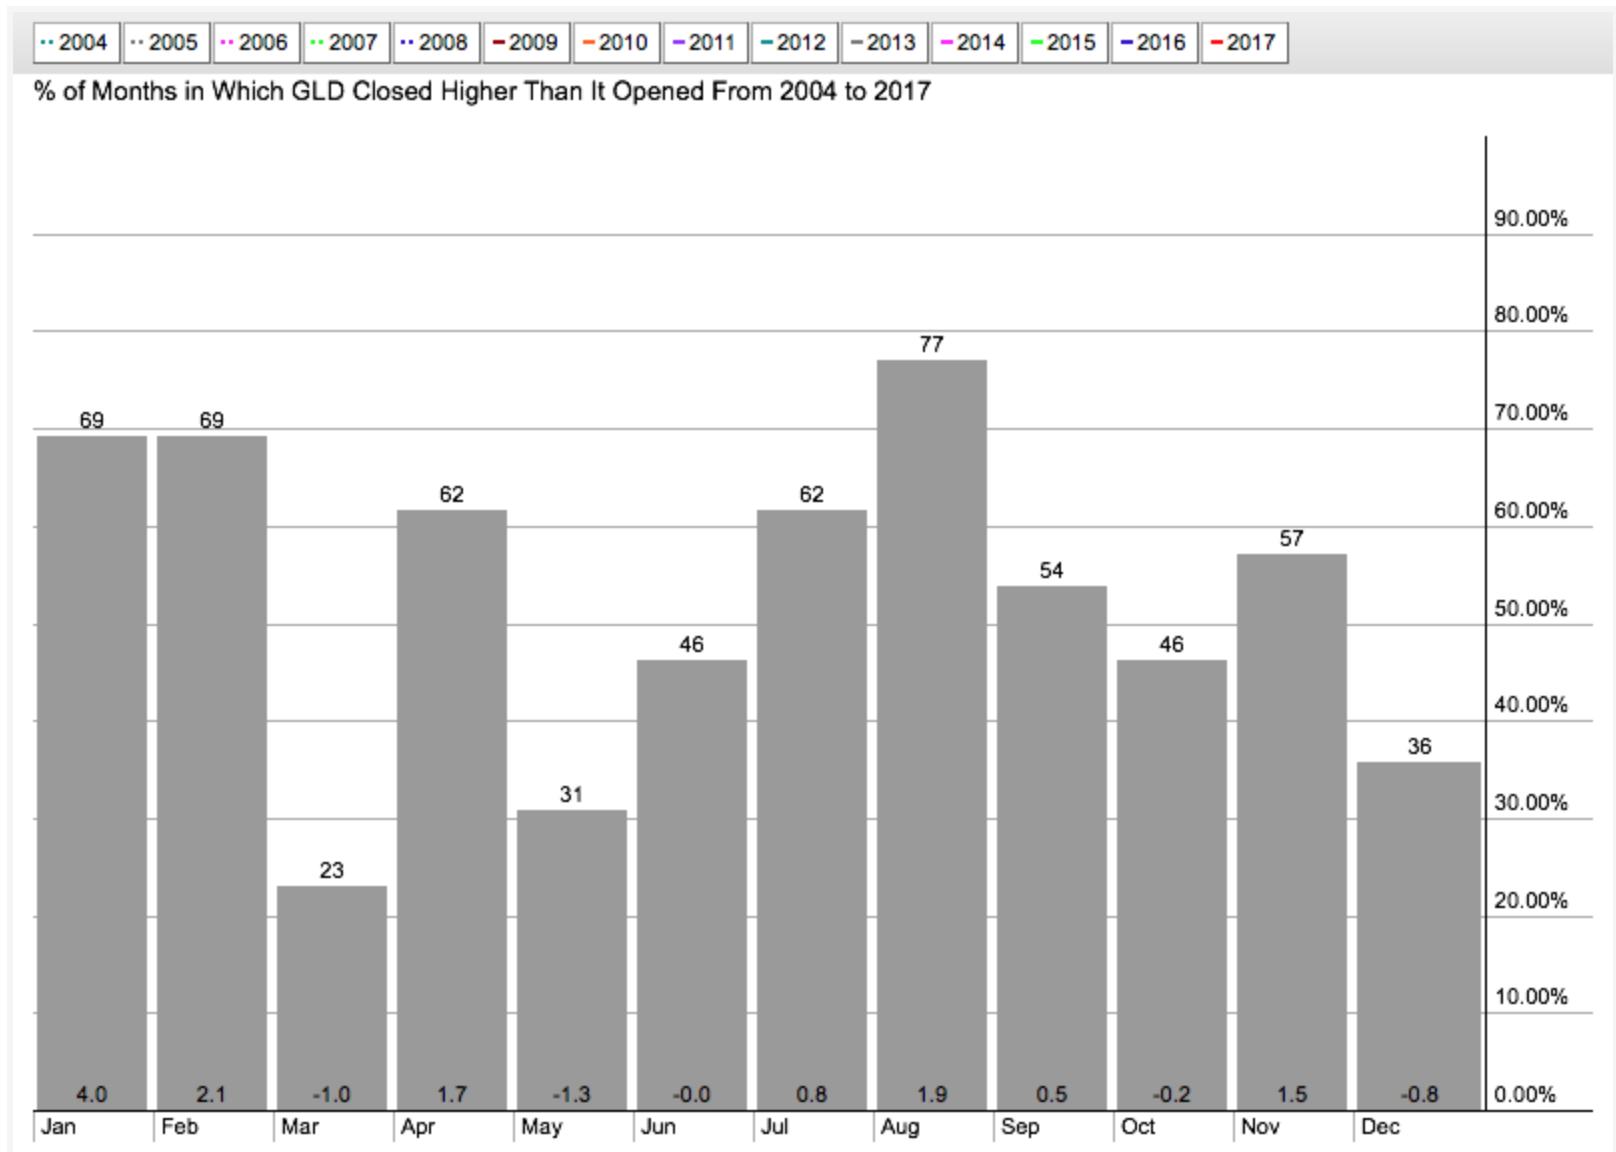 gold price seasonality by month_15 years data_december bearish